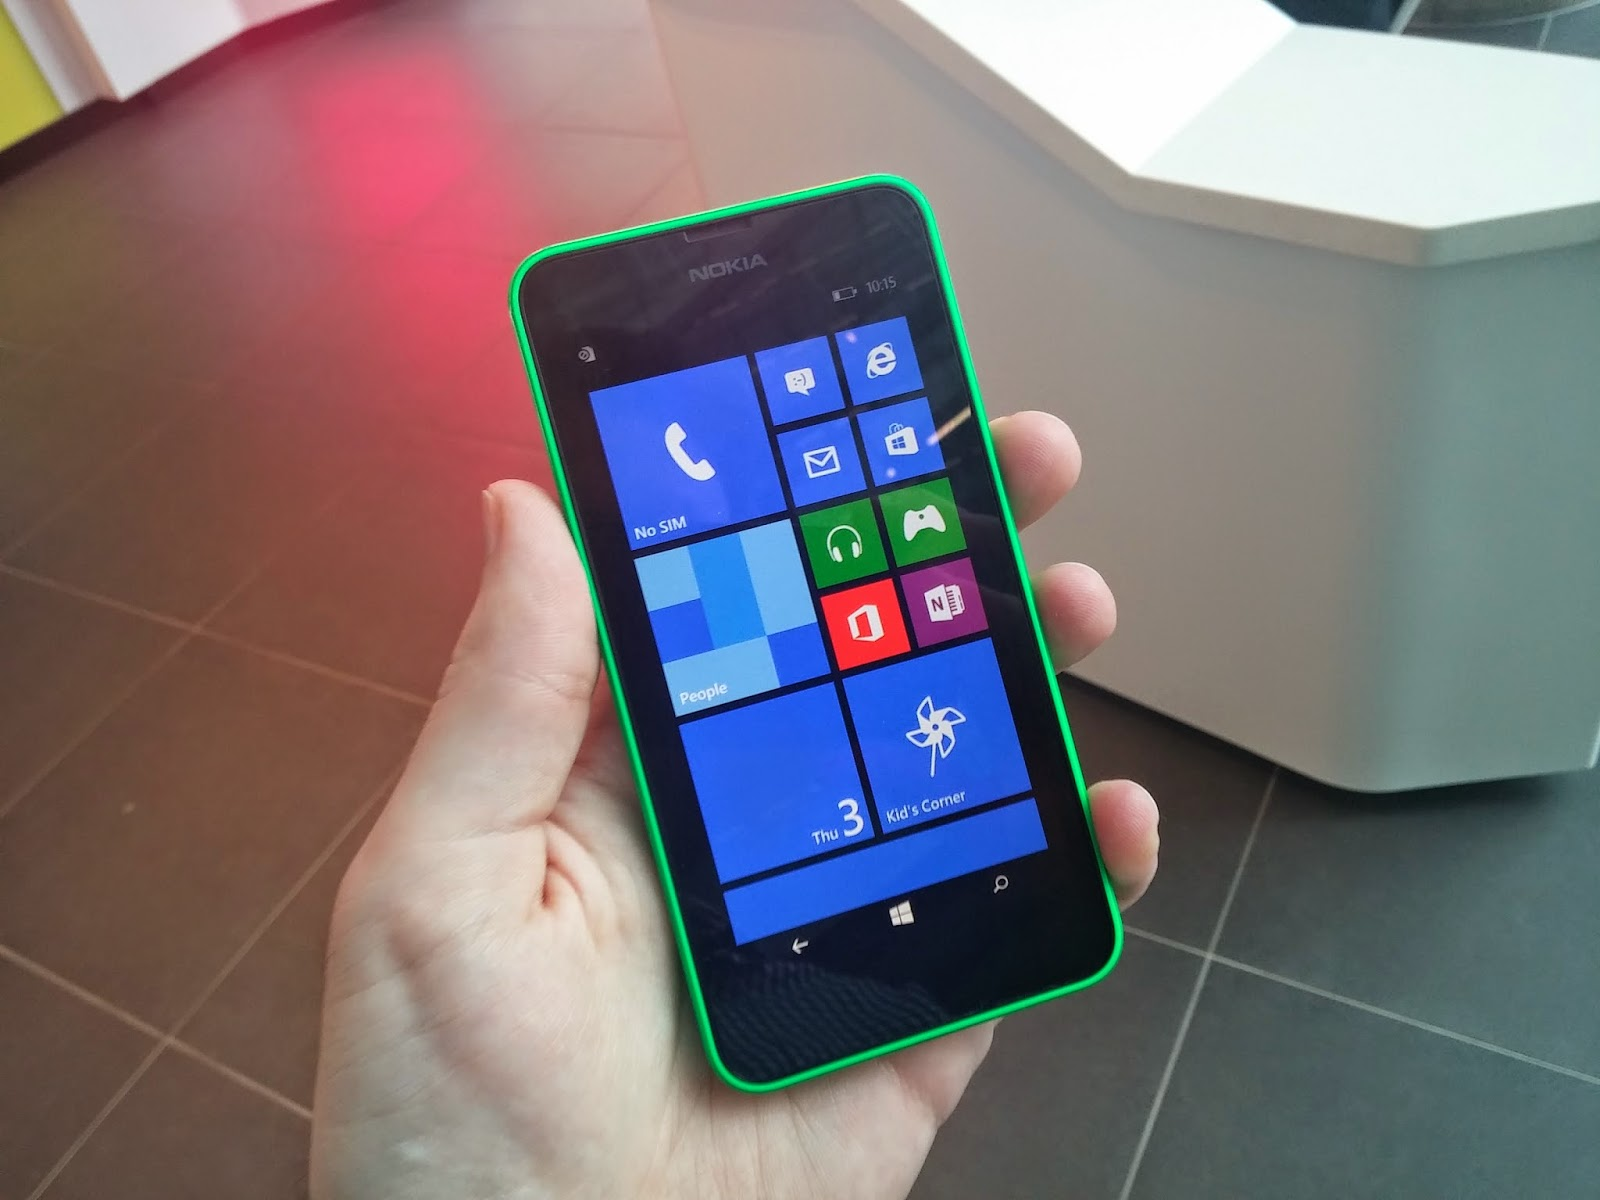 "<img src=""http://1.bp.blogspot.com/-Ej1R0BgIR1U/U0MJLpJy8HI/AAAAAAAACJs/evK91HnJiiY/s1600/Nokia_Lumia_635.jpg"" alt=""Nokia Lumia 630 and Lumia 635 review"" />"